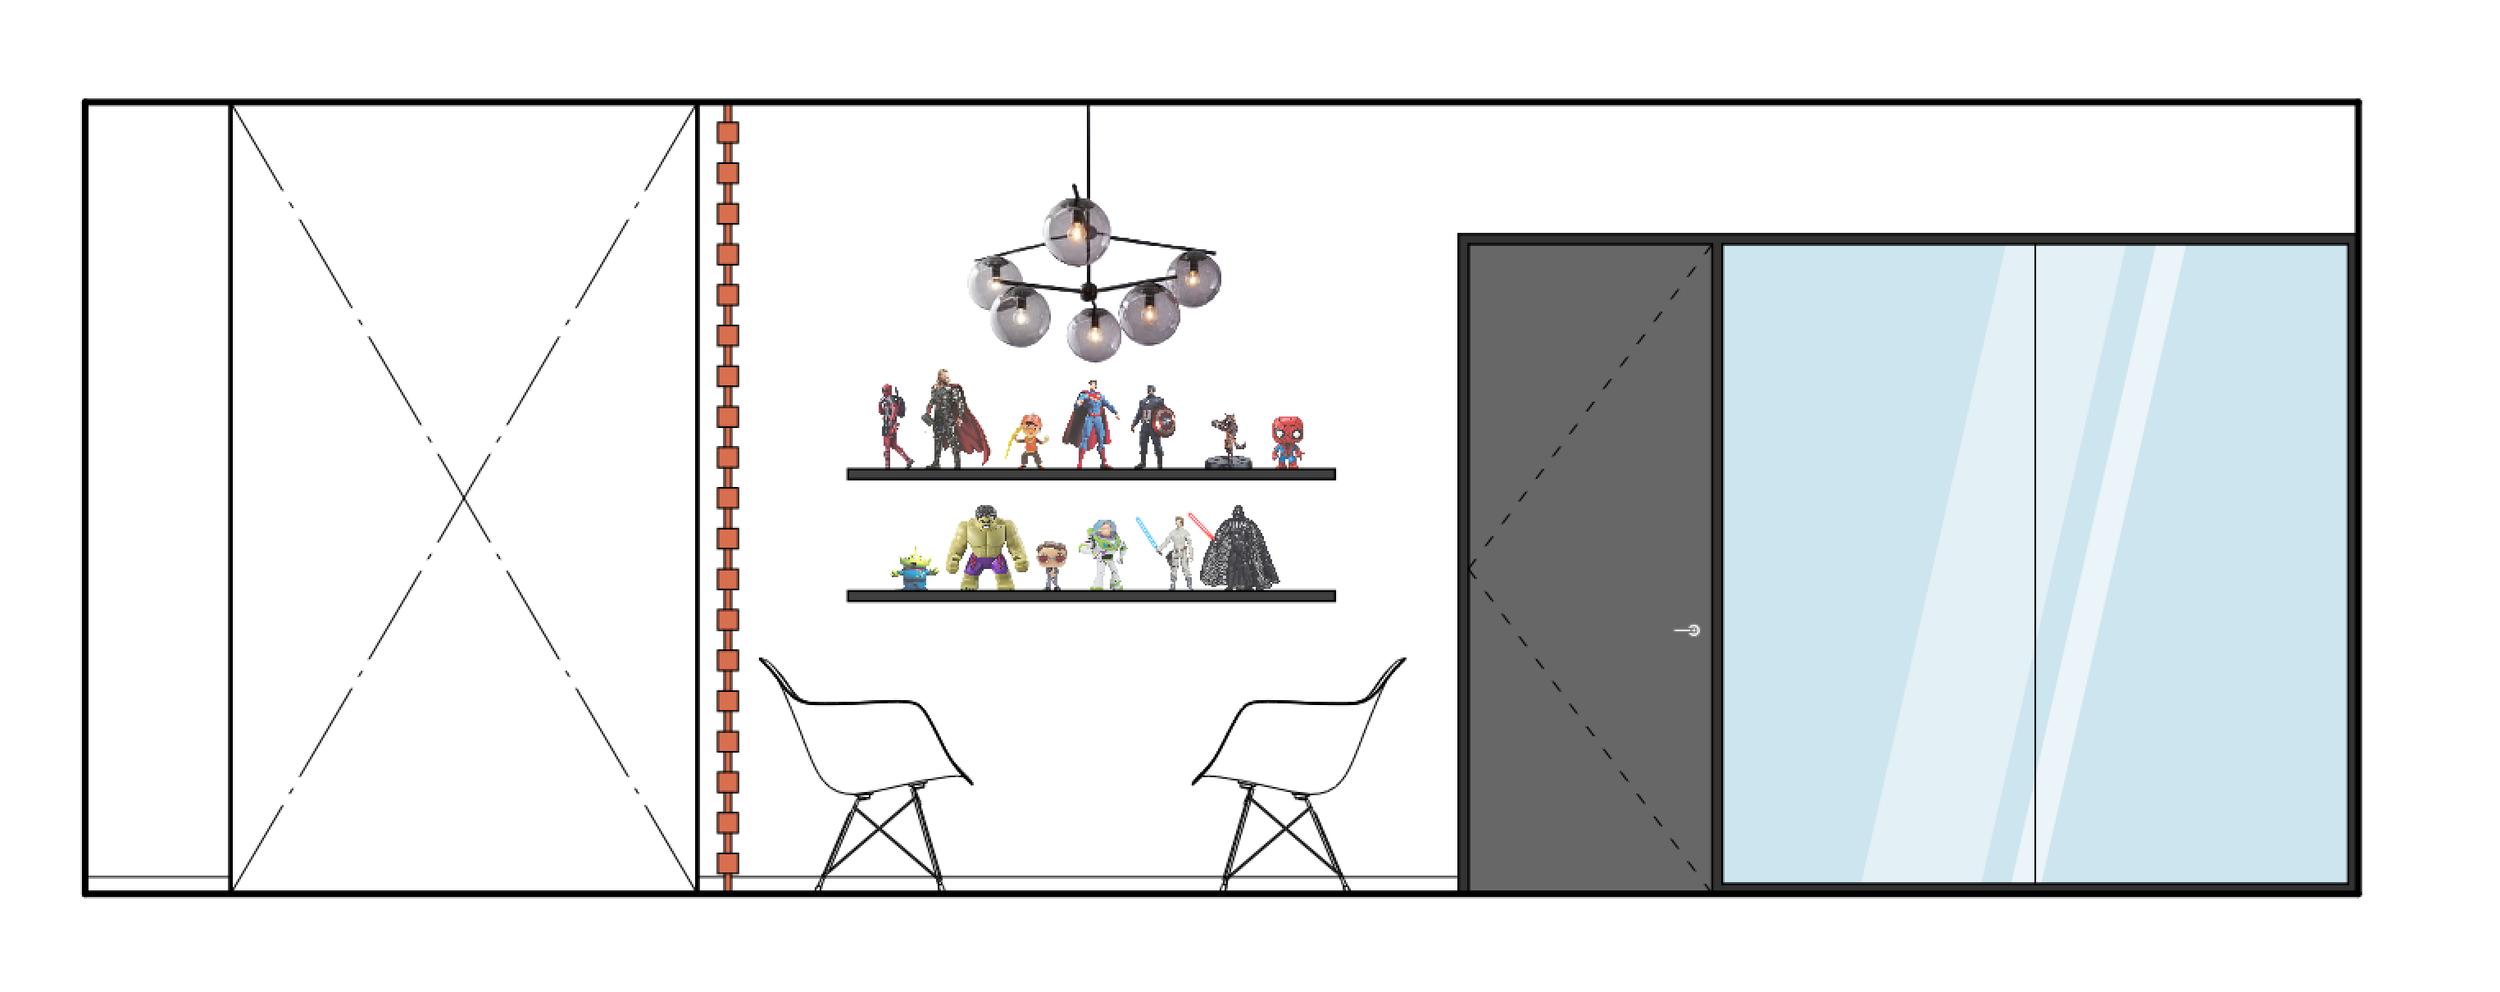 Inspiration and elevation: Eastlake Studio